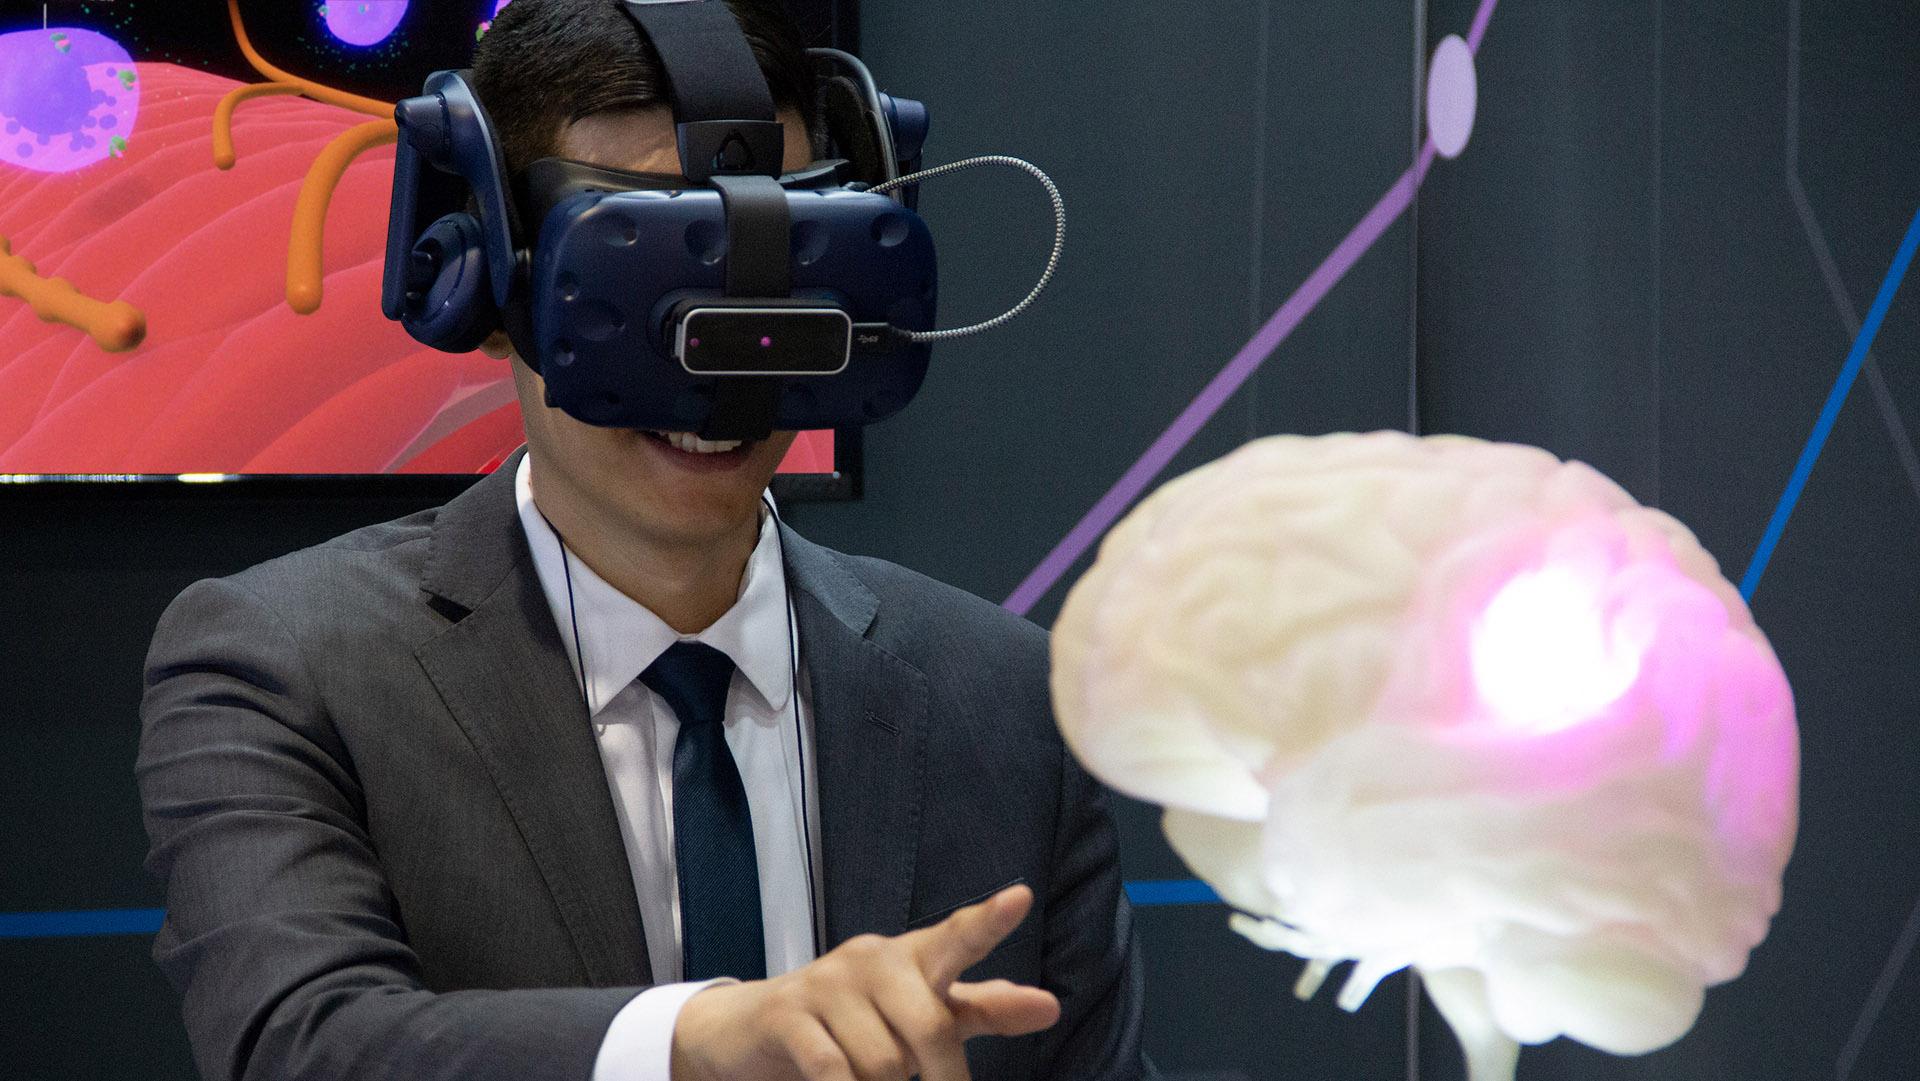 axs-studio-medical-interactive-vr-neuroscience-migraine-01